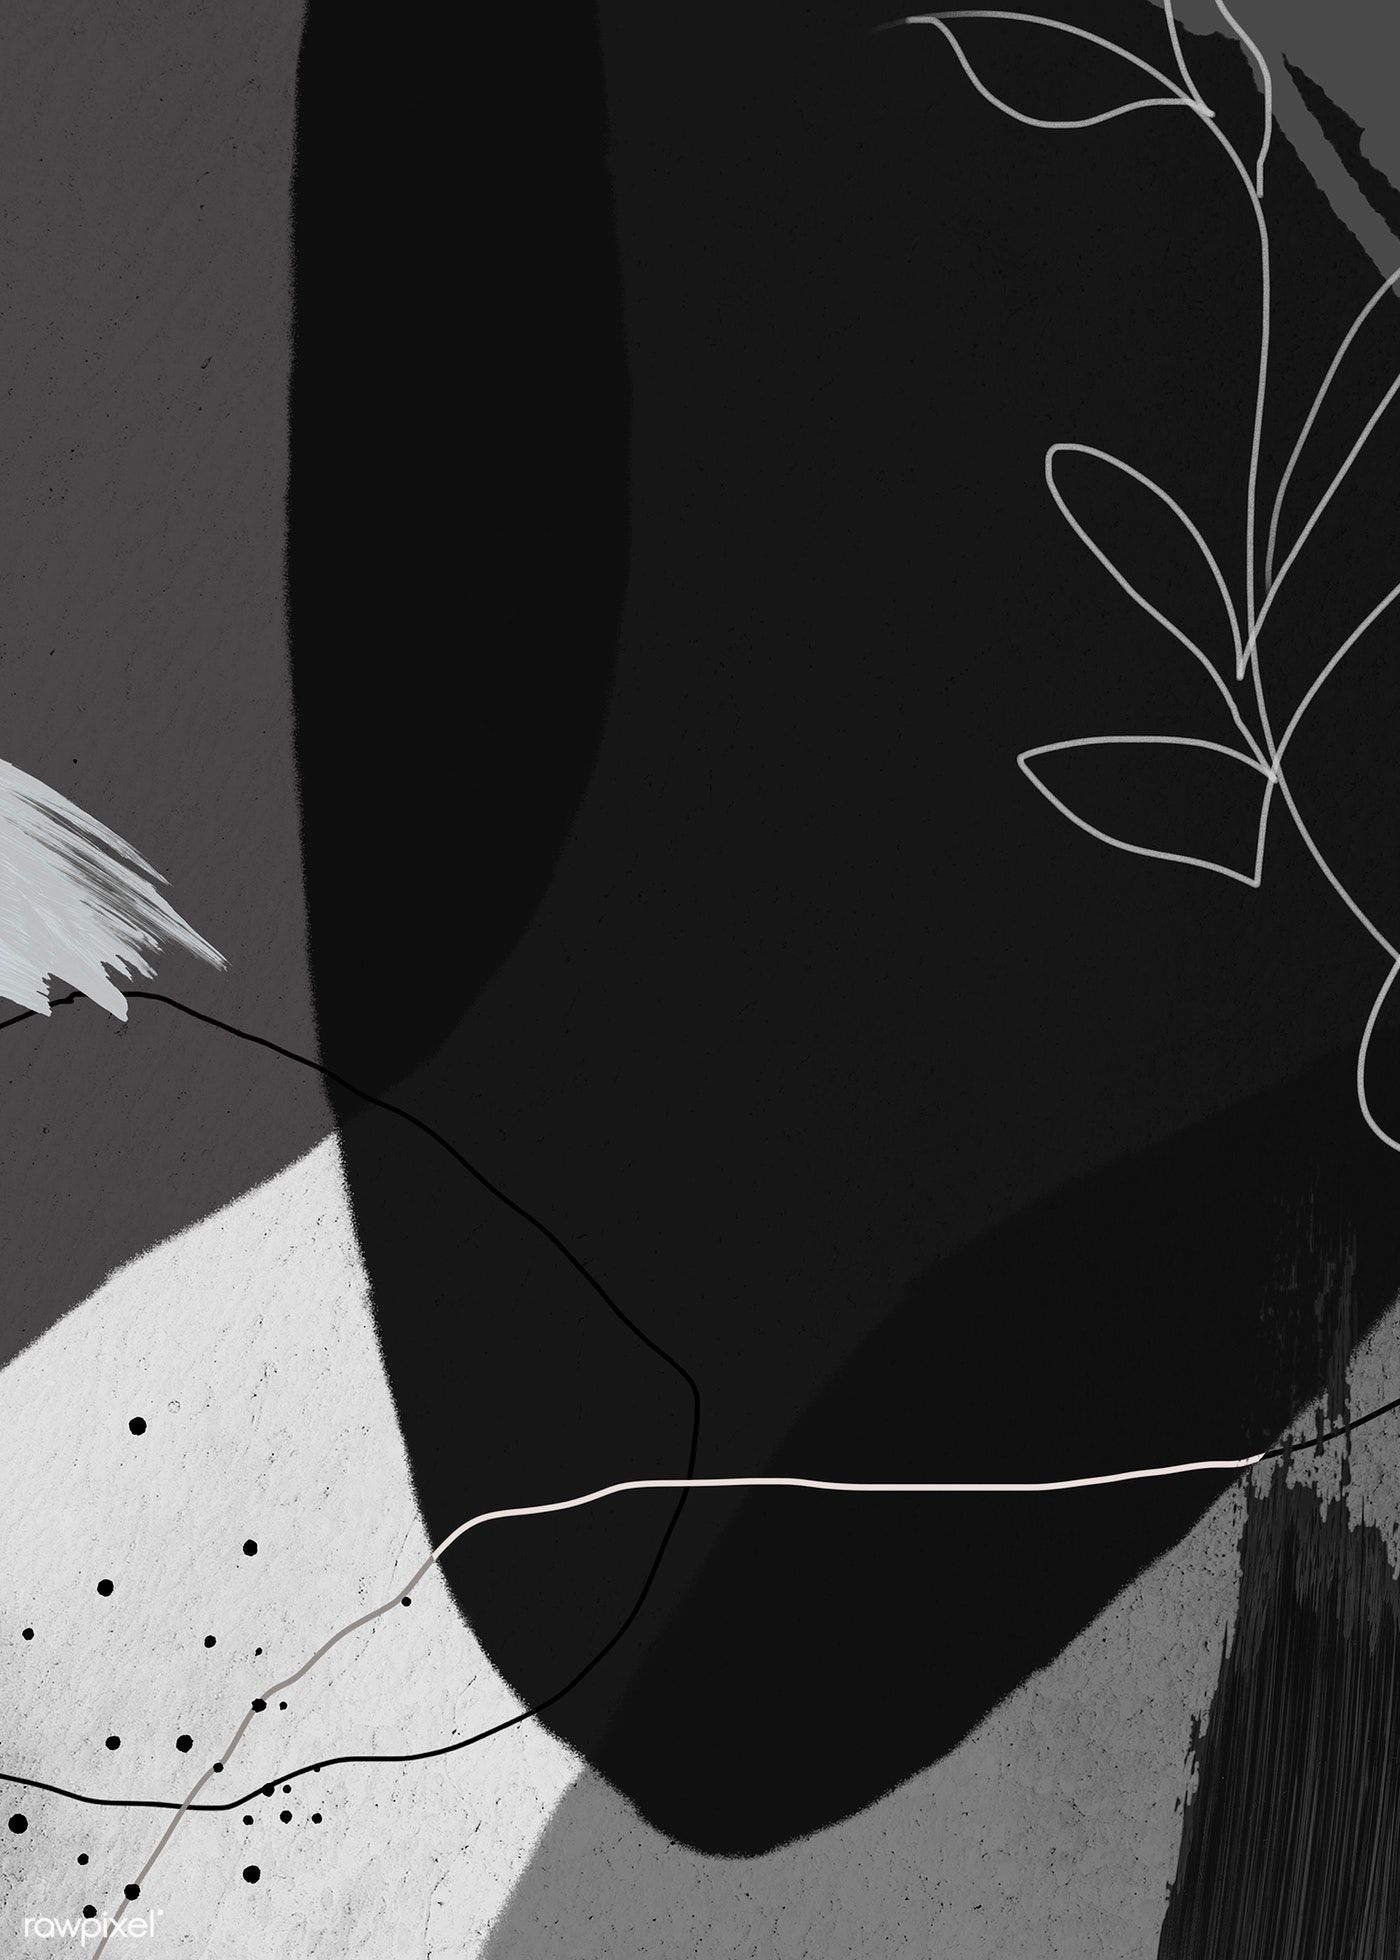 Download premium illustration of Abstract dark tone